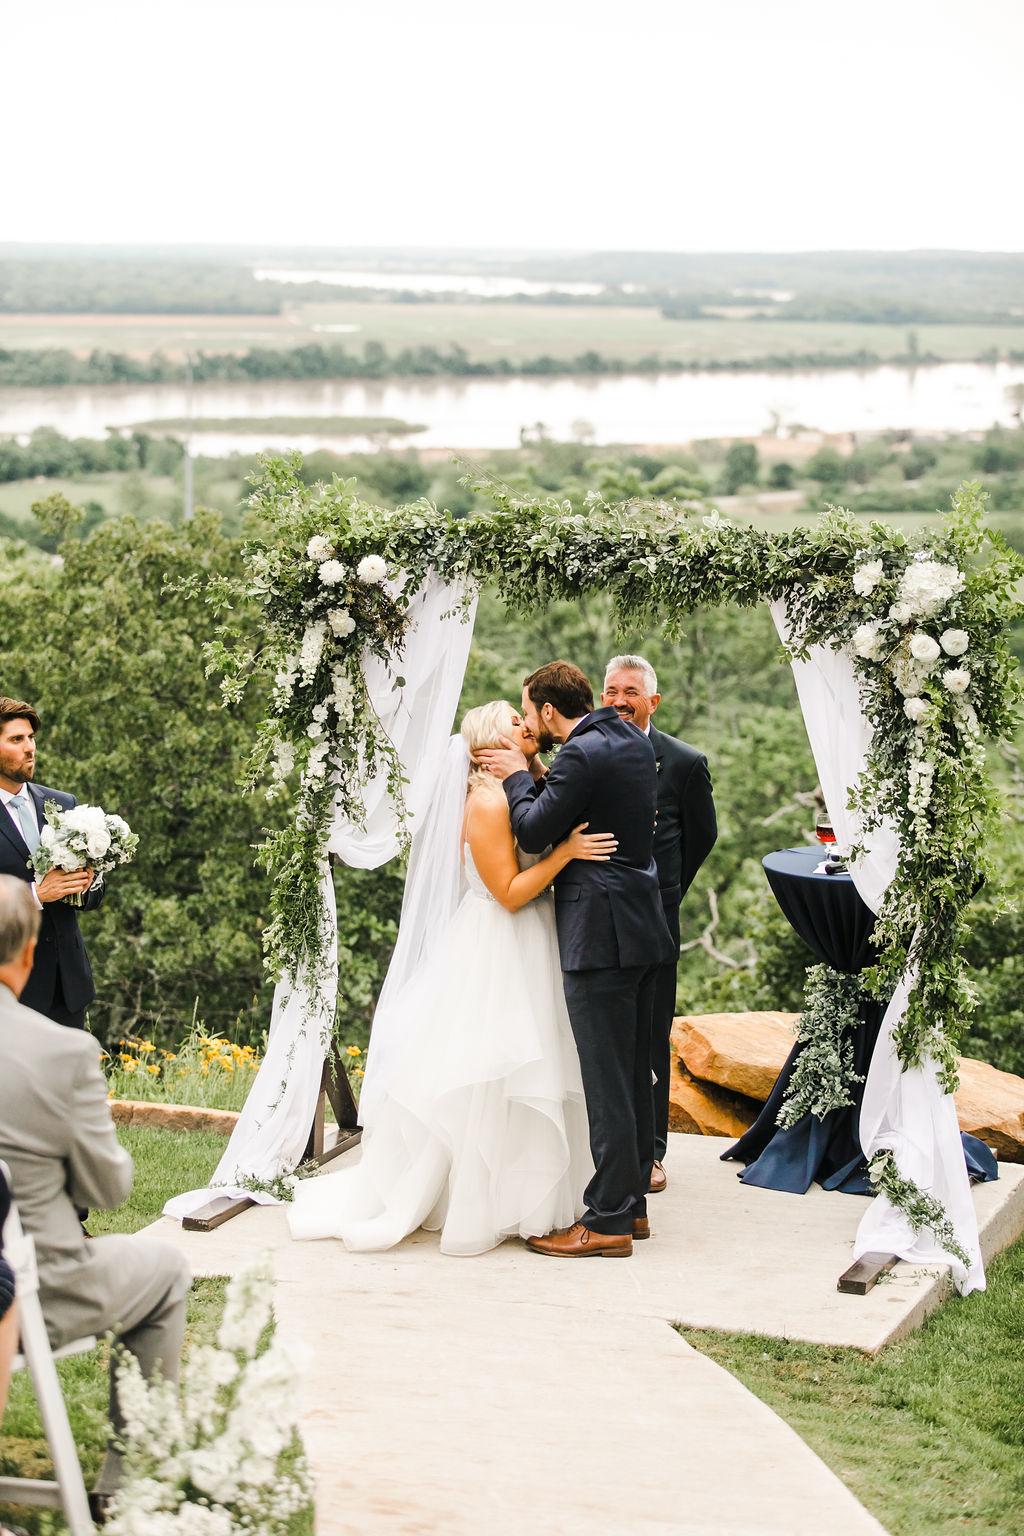 Dream Point Ranch Tulsa's White Barn Wedding Venue 78.jpg